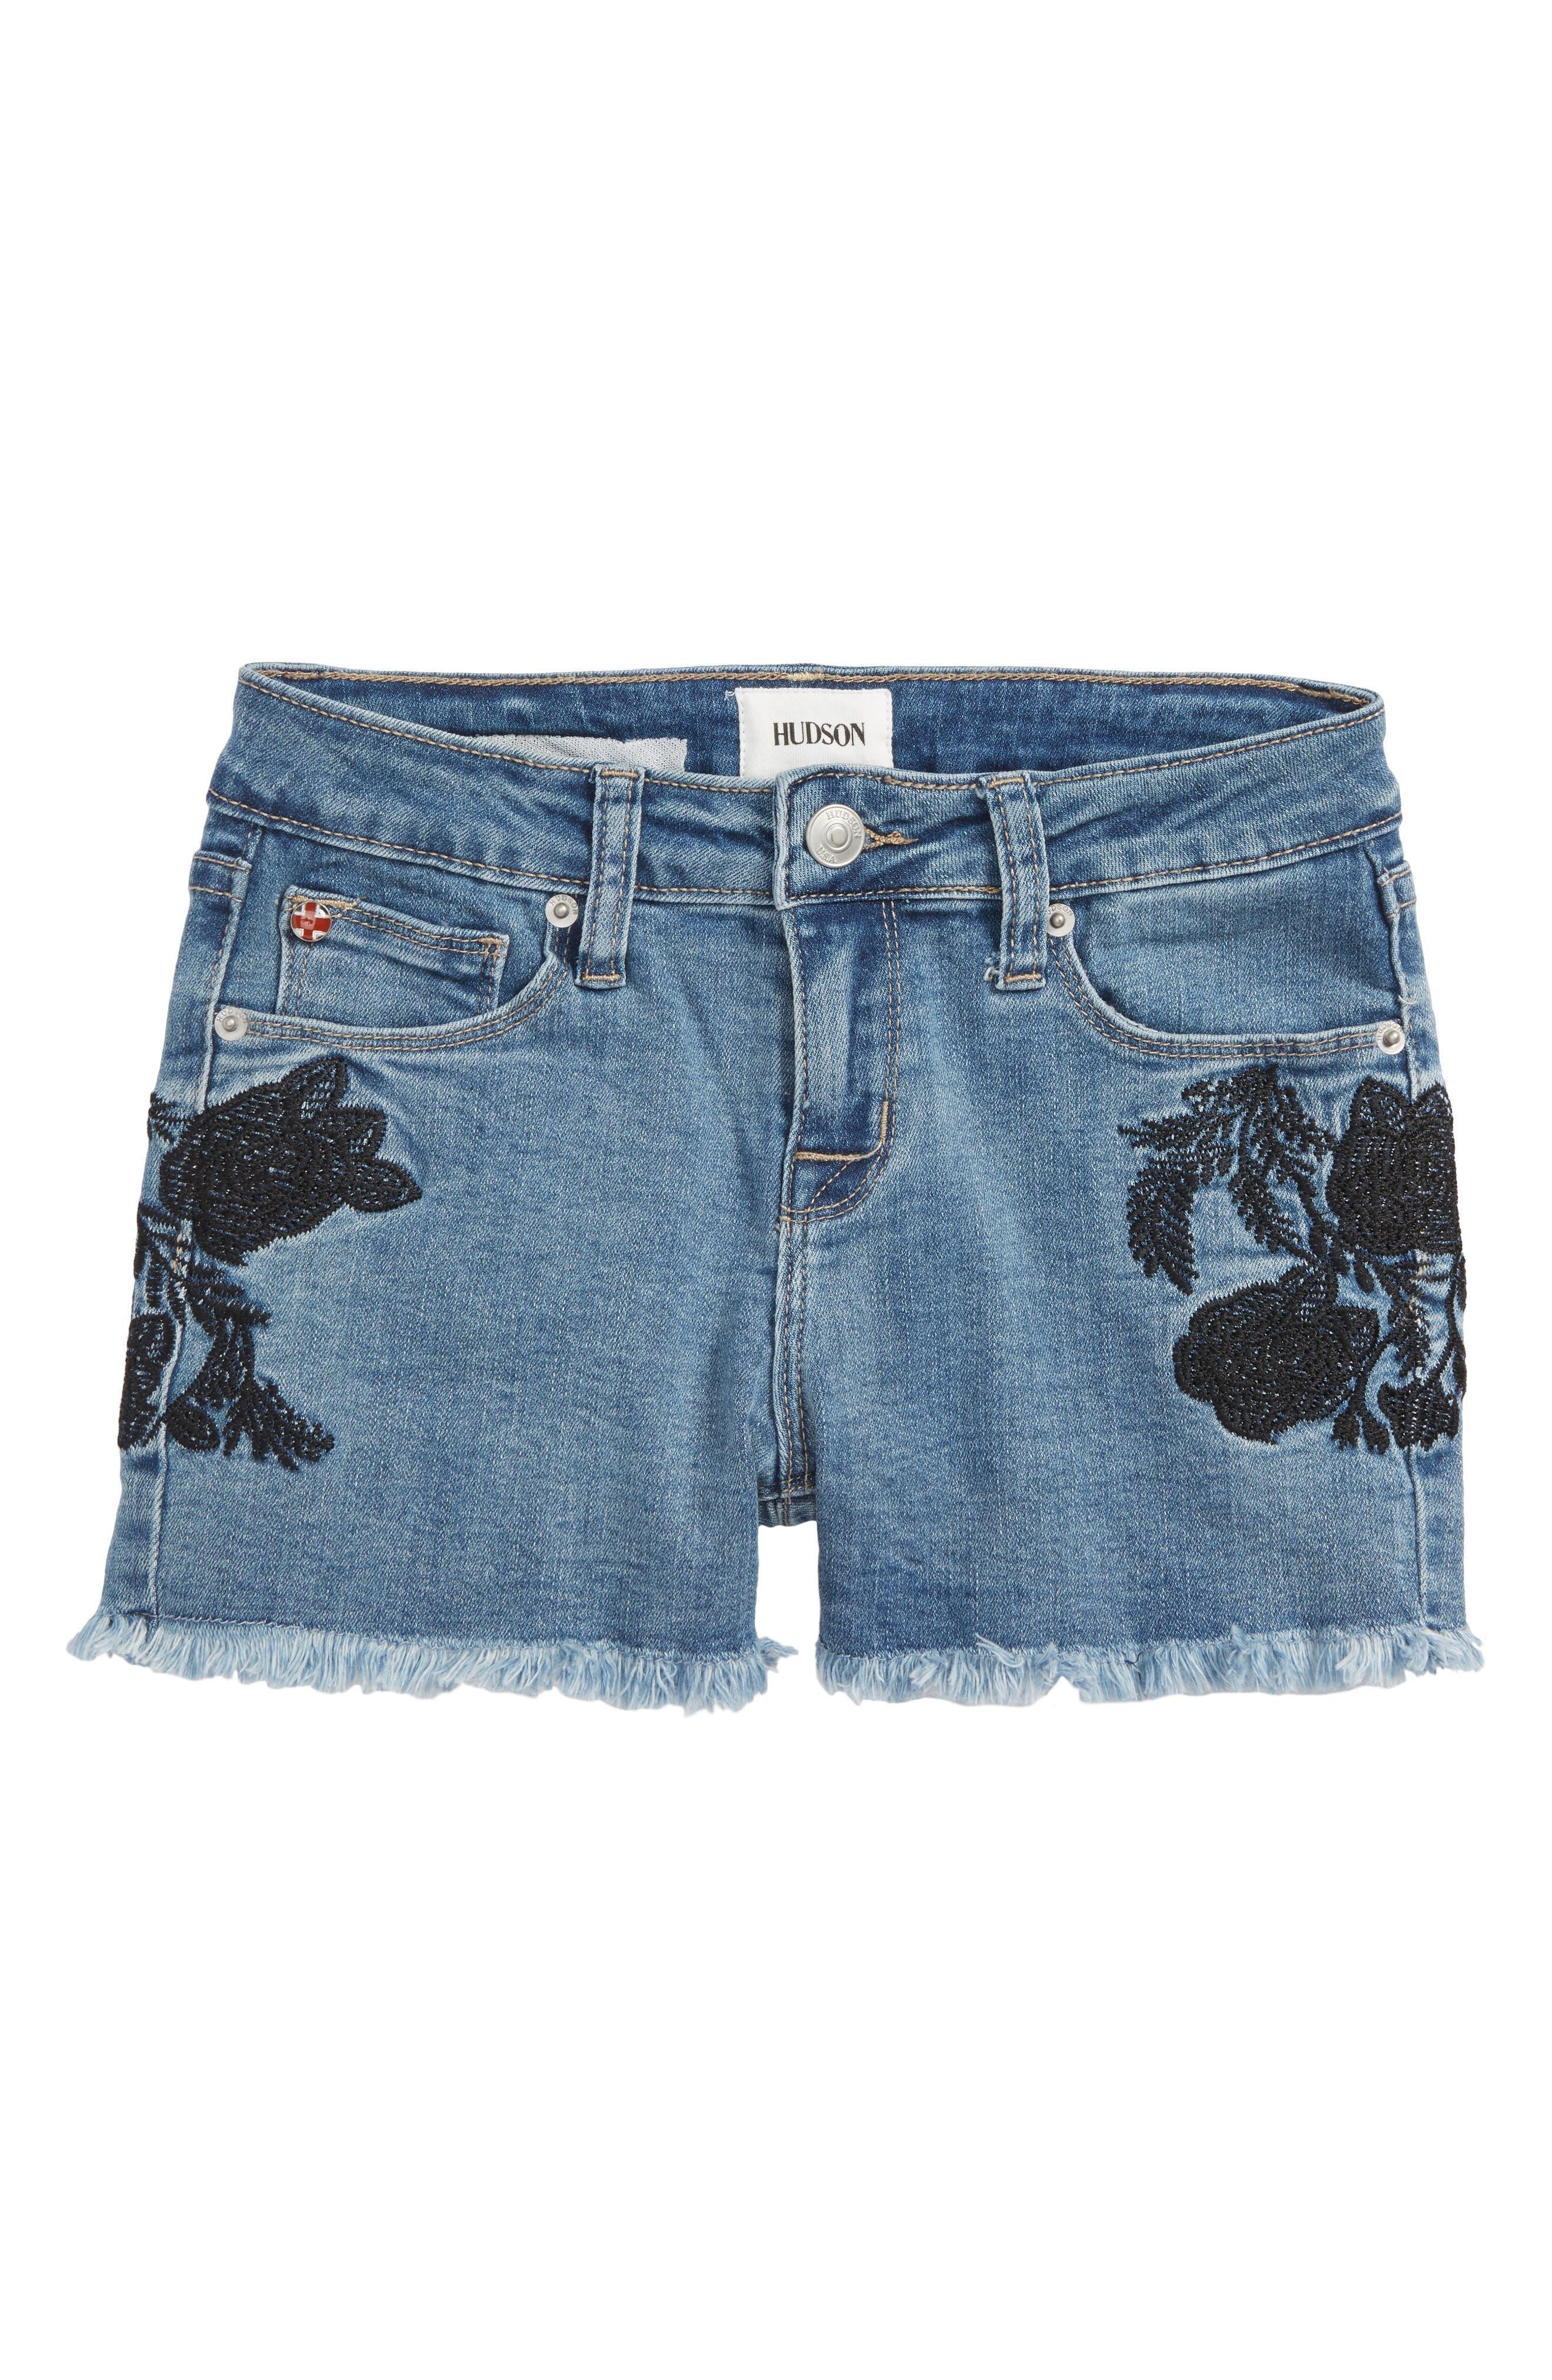 Floral Embroidery Frayed Hem Shorts,                             Main thumbnail 1, color,